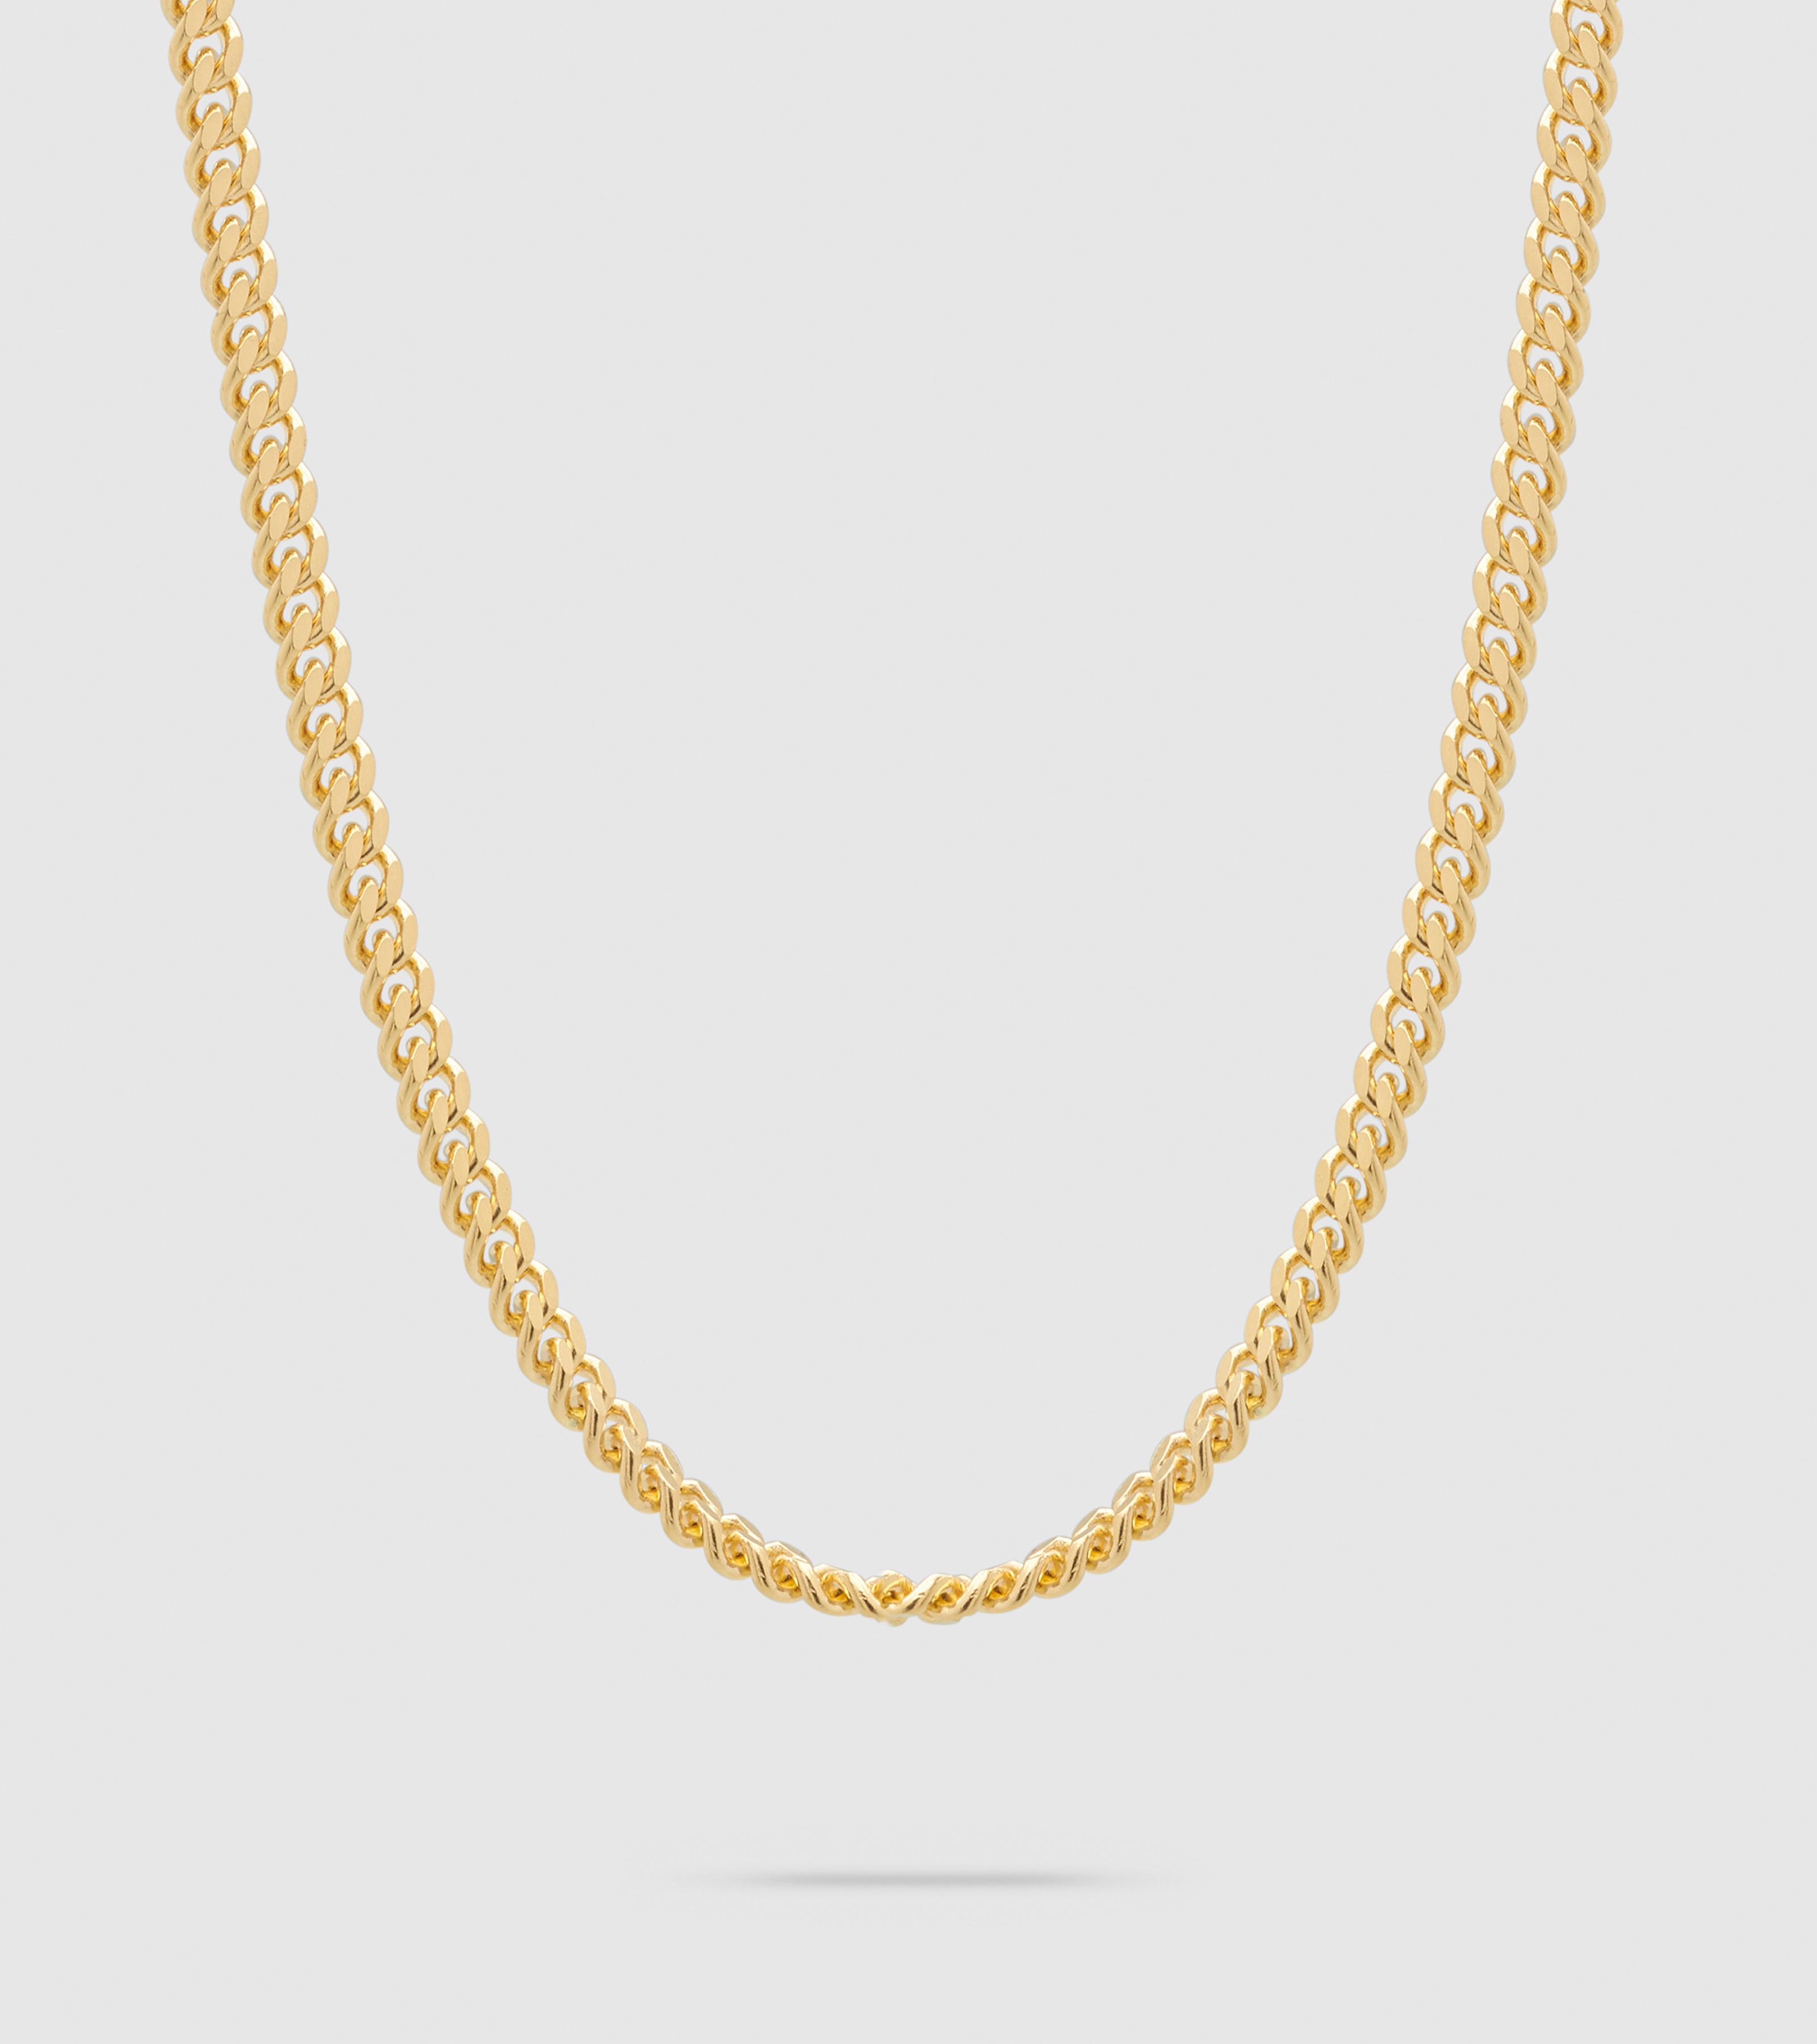 Curb Chain L Gold